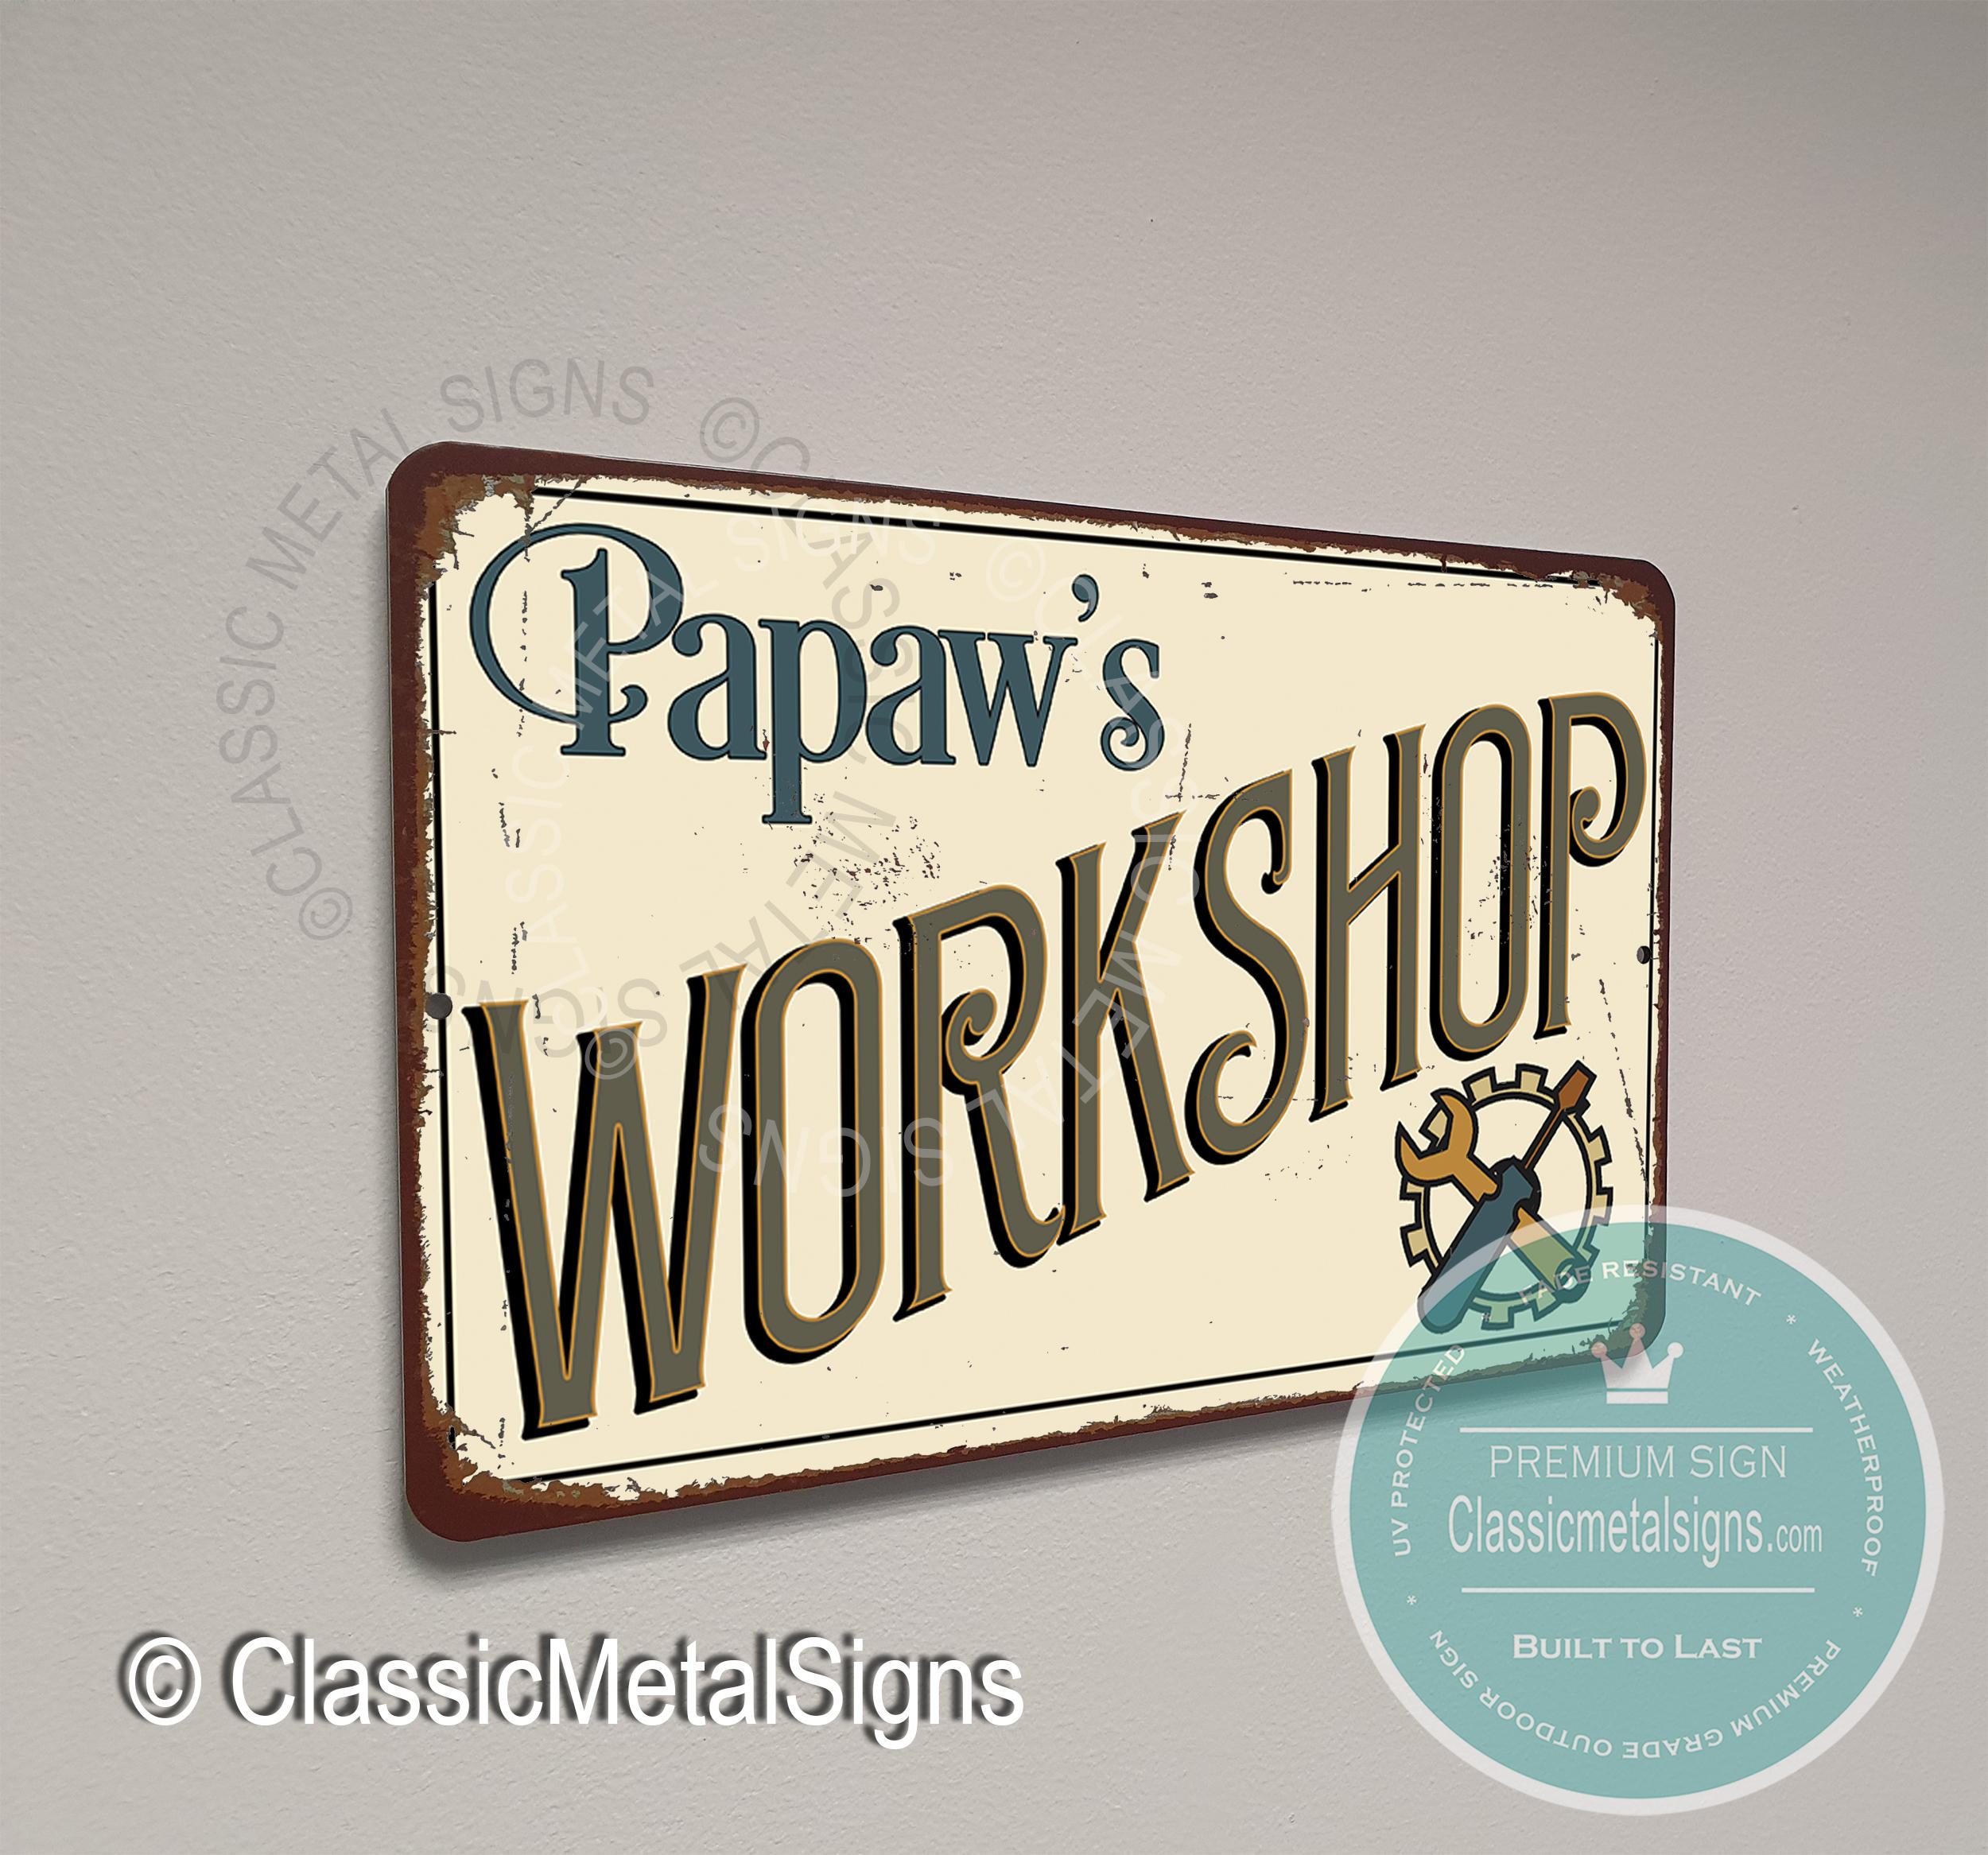 Papaw's Workshop Signs